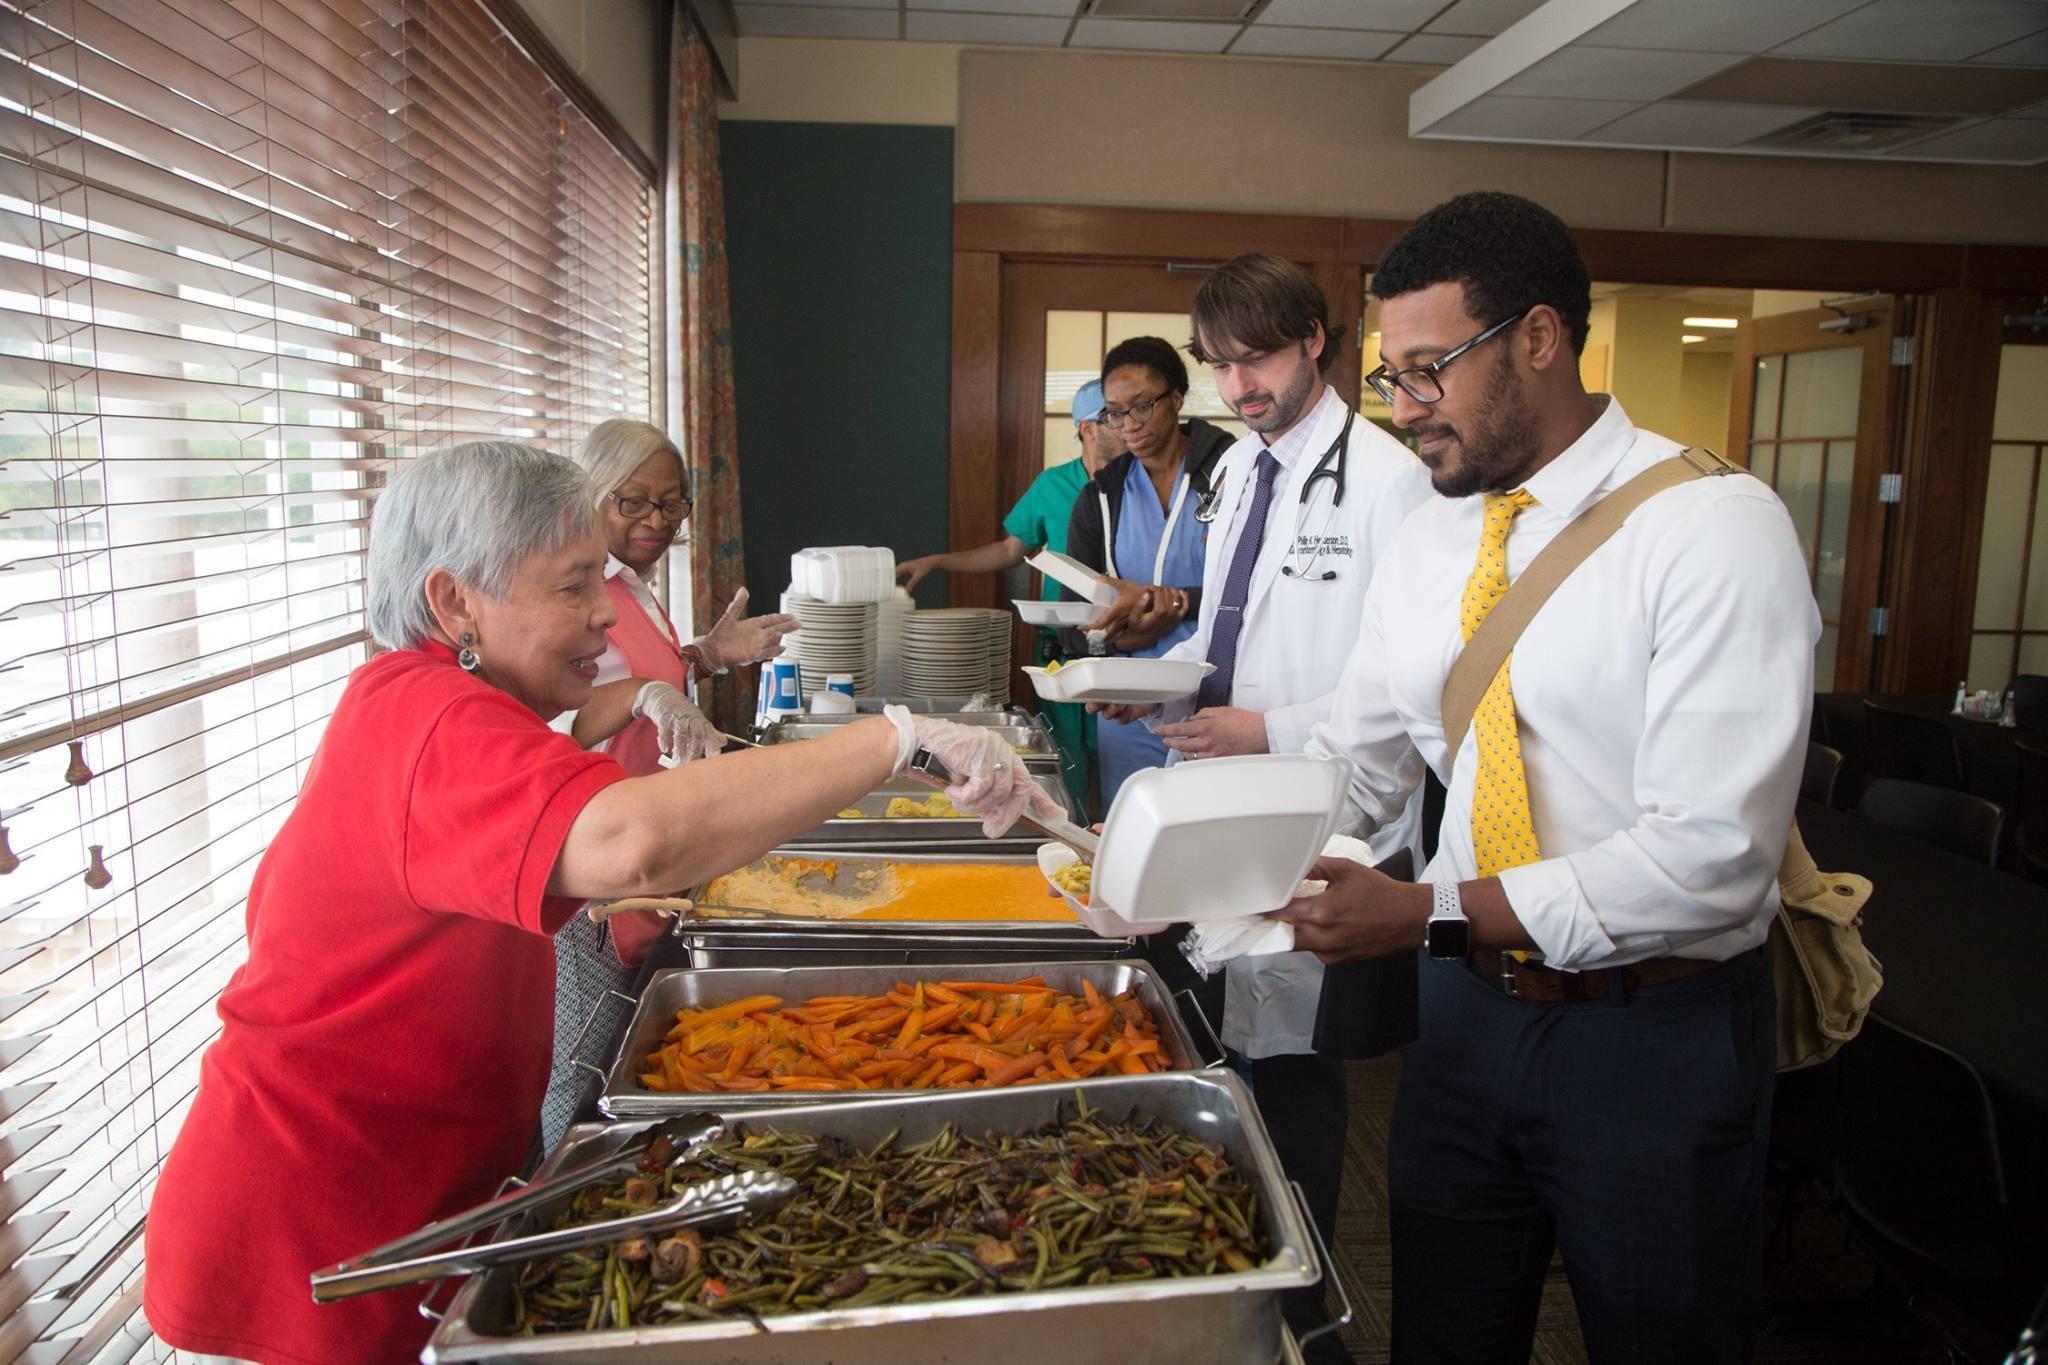 Volunteering at USA Health University Hospital